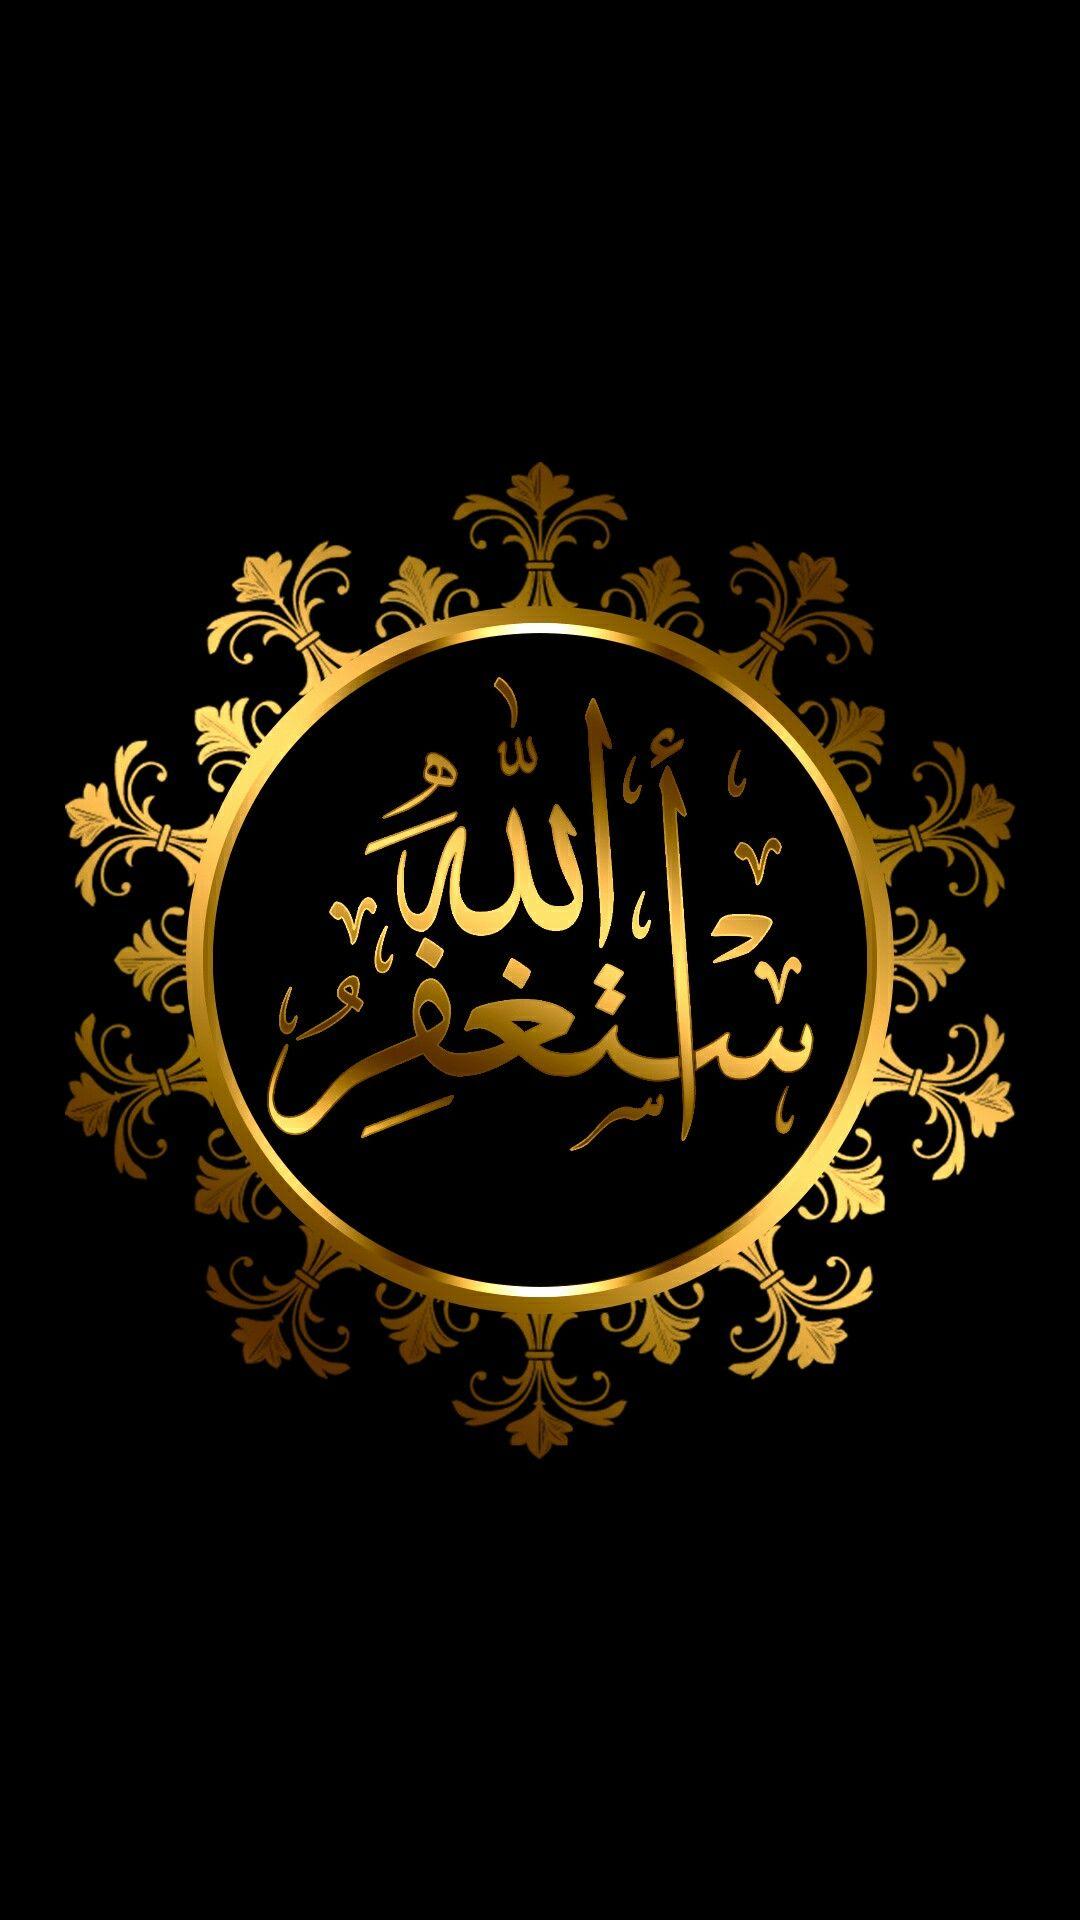 Astaghfirullah Kaligrafi Islam Islam Dan Kaligrafi Arab